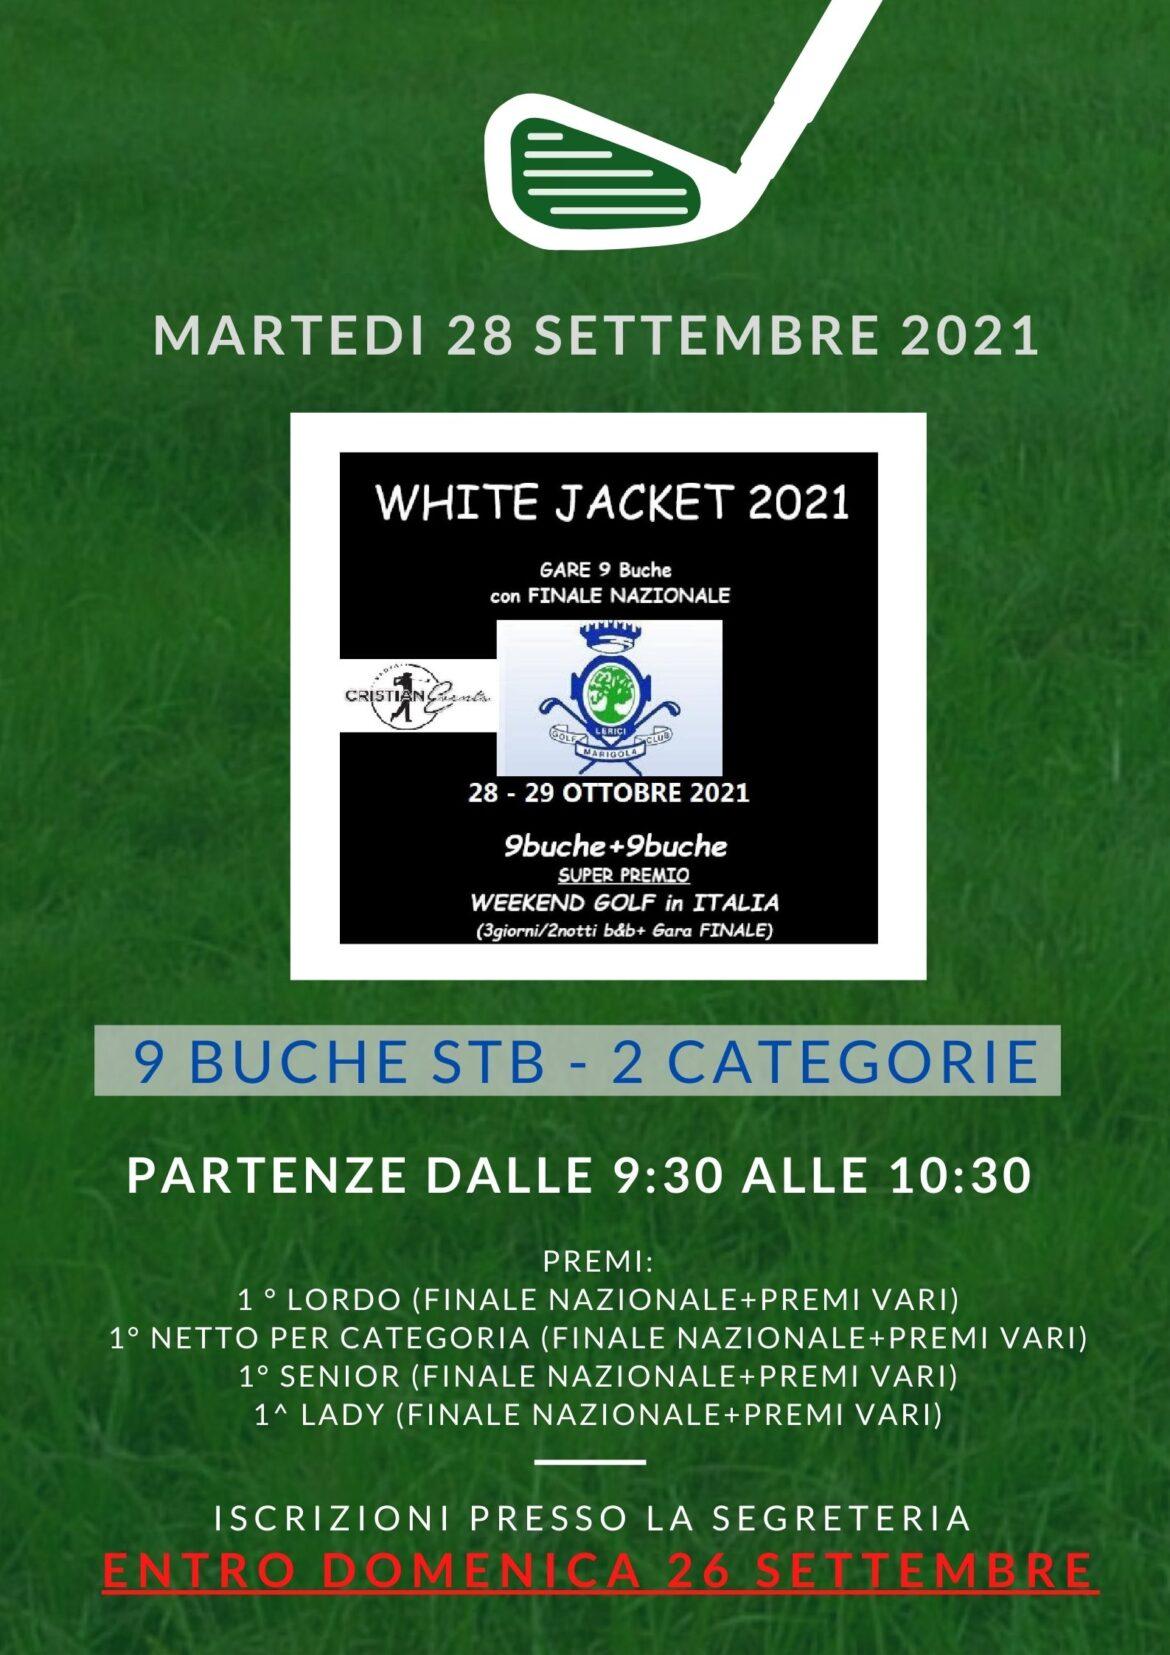 WHITE JACKET by Nuova Cristianevents – 28 settembre 2021